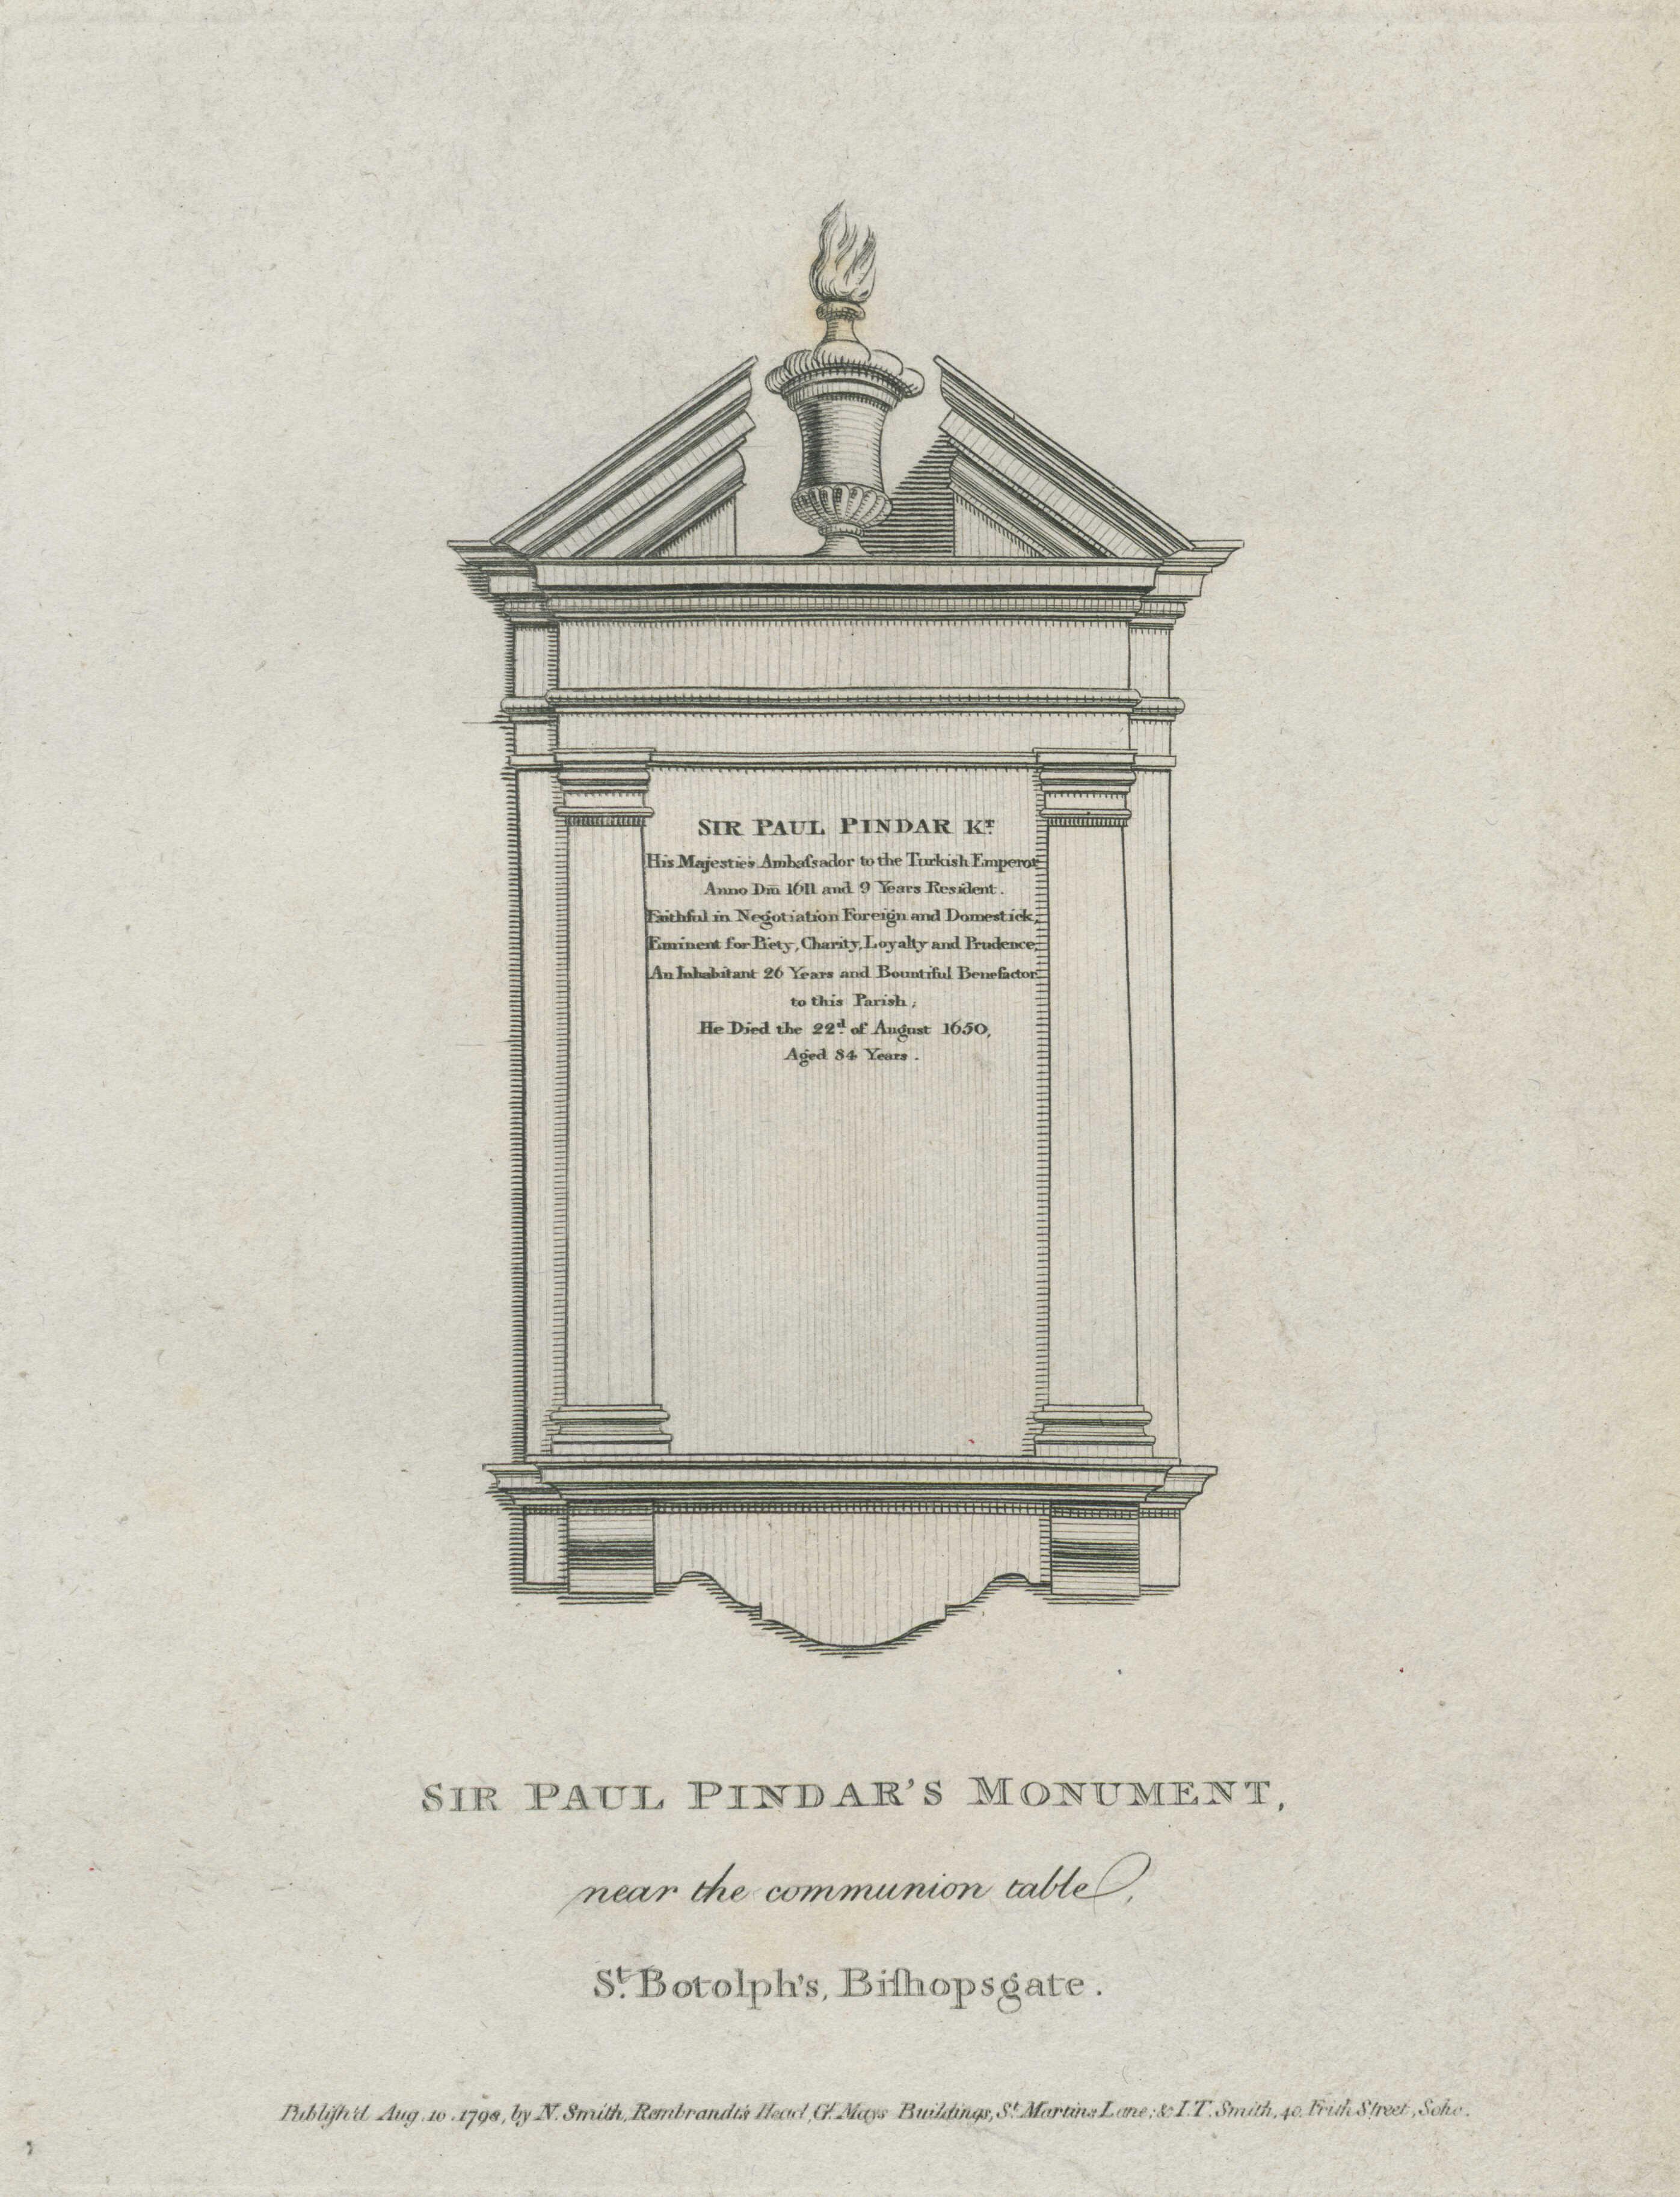 69-sir-paul-pindars-monument-near-the-communion-table-st-botolphs-bishopsgate